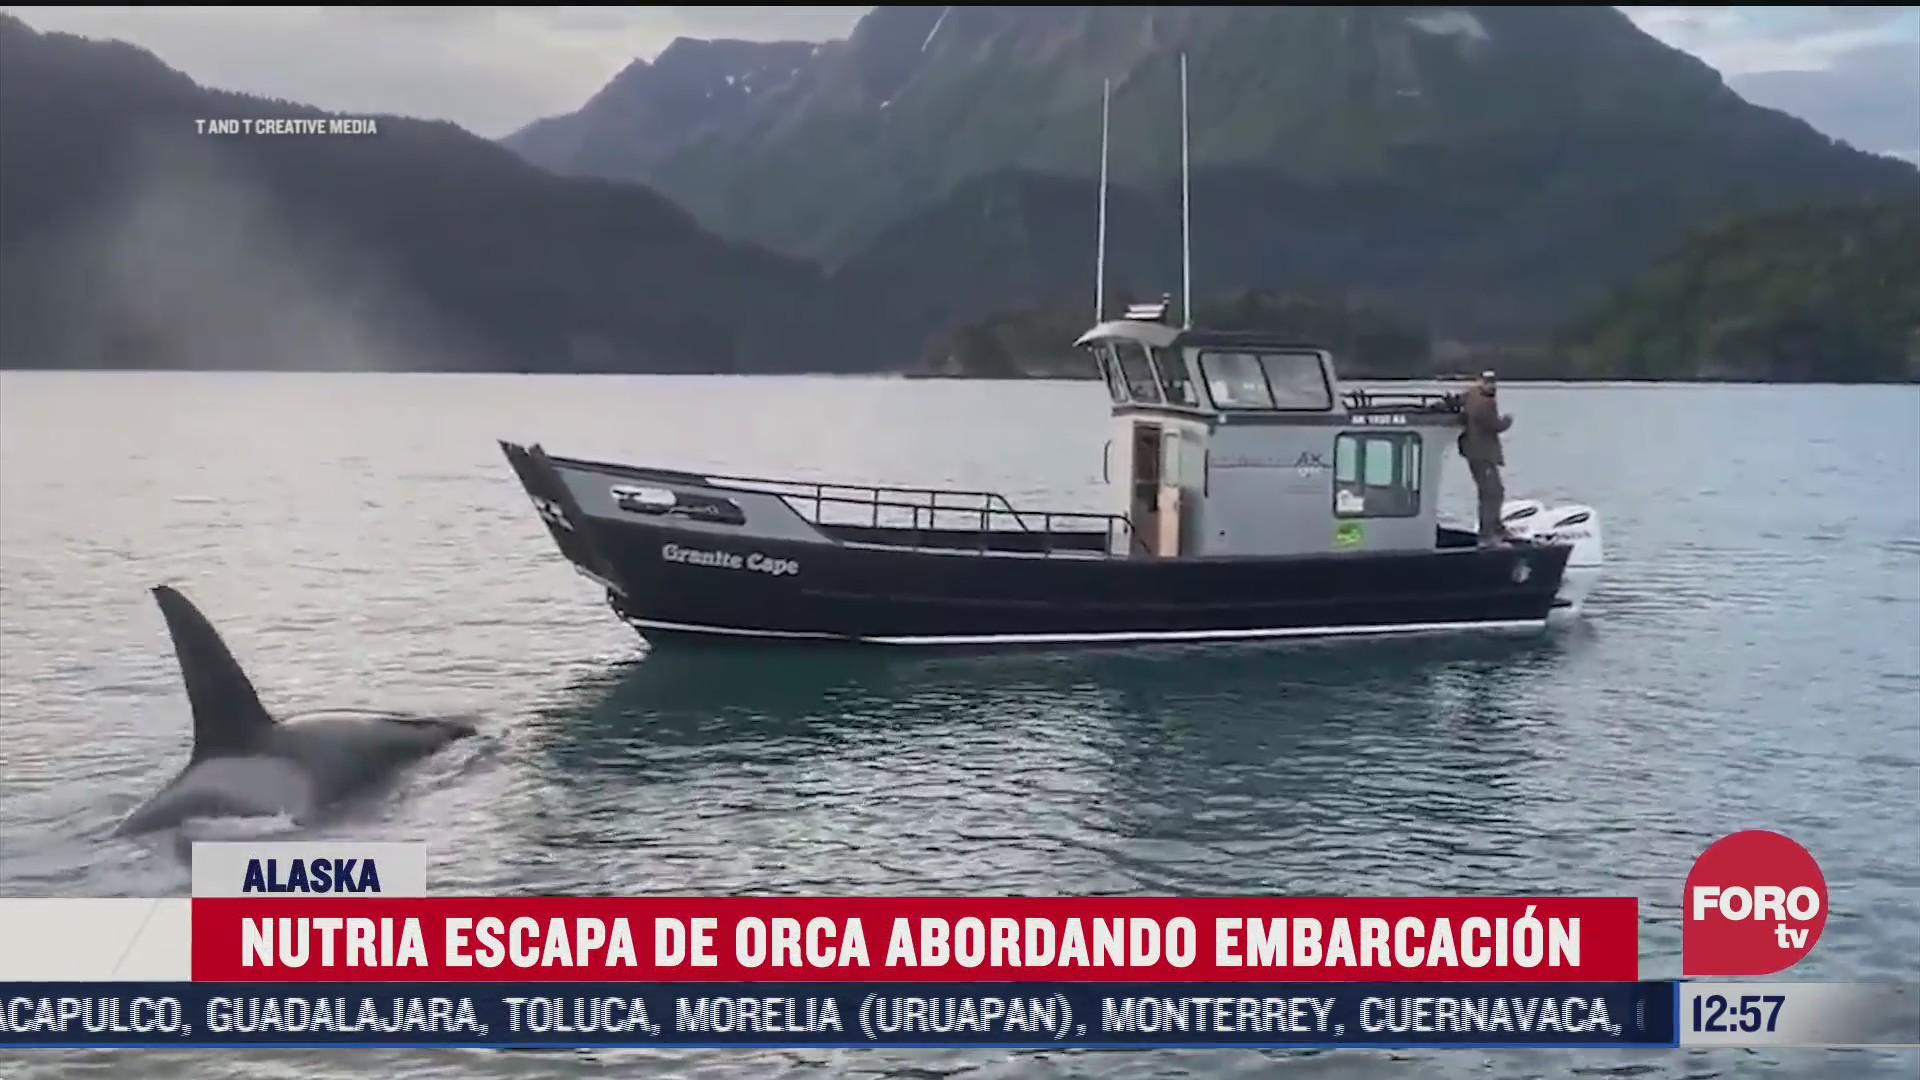 nutria escapa de orca abordando embarcacion en alaska